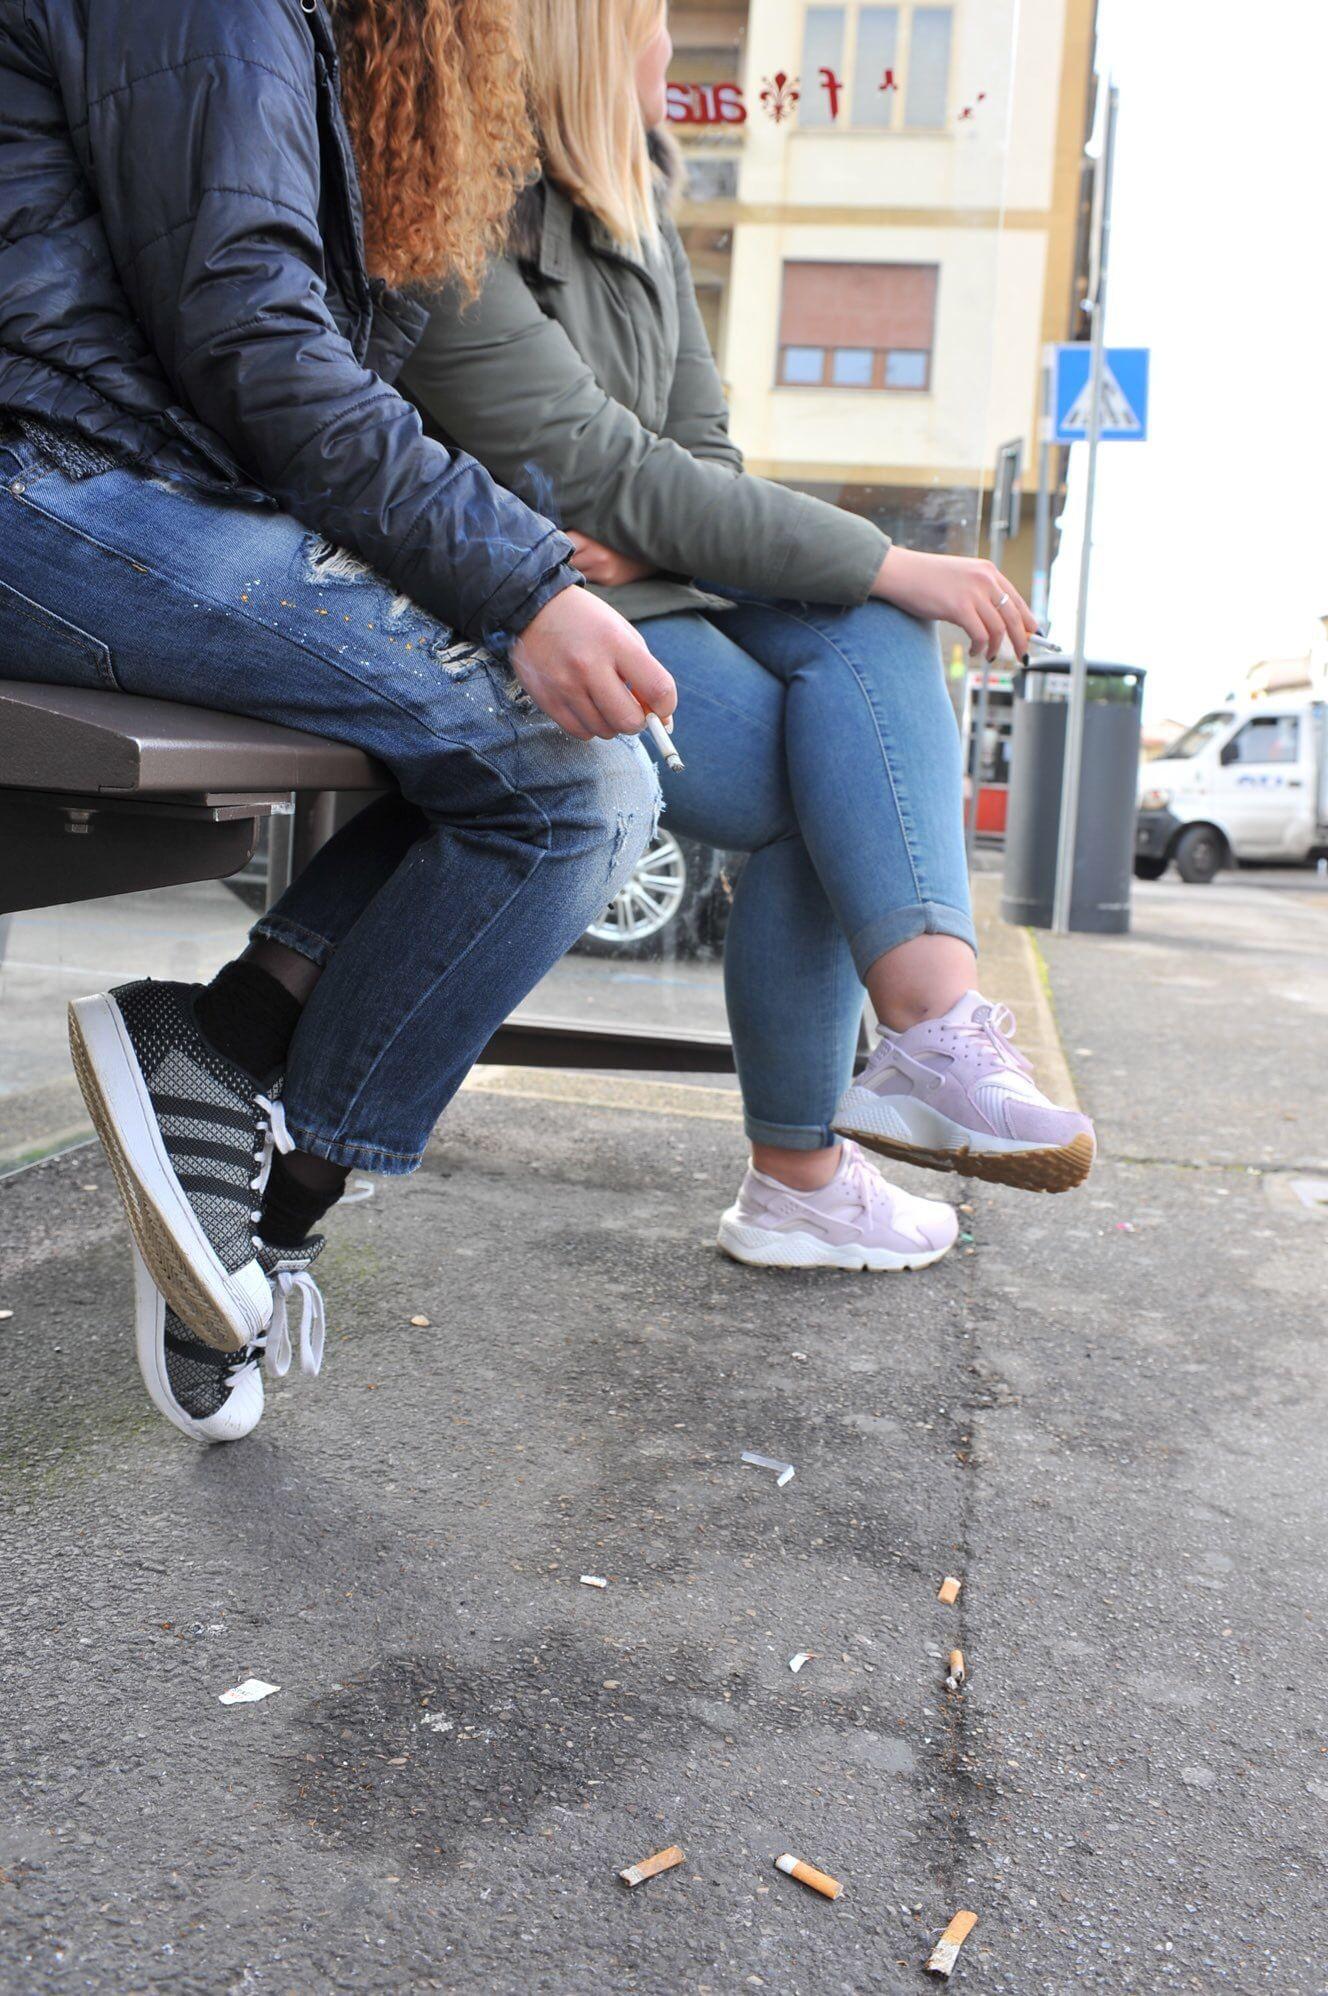 Firenze, stop ai mozziconi per terra, 30 mila posacenere portatili gratis